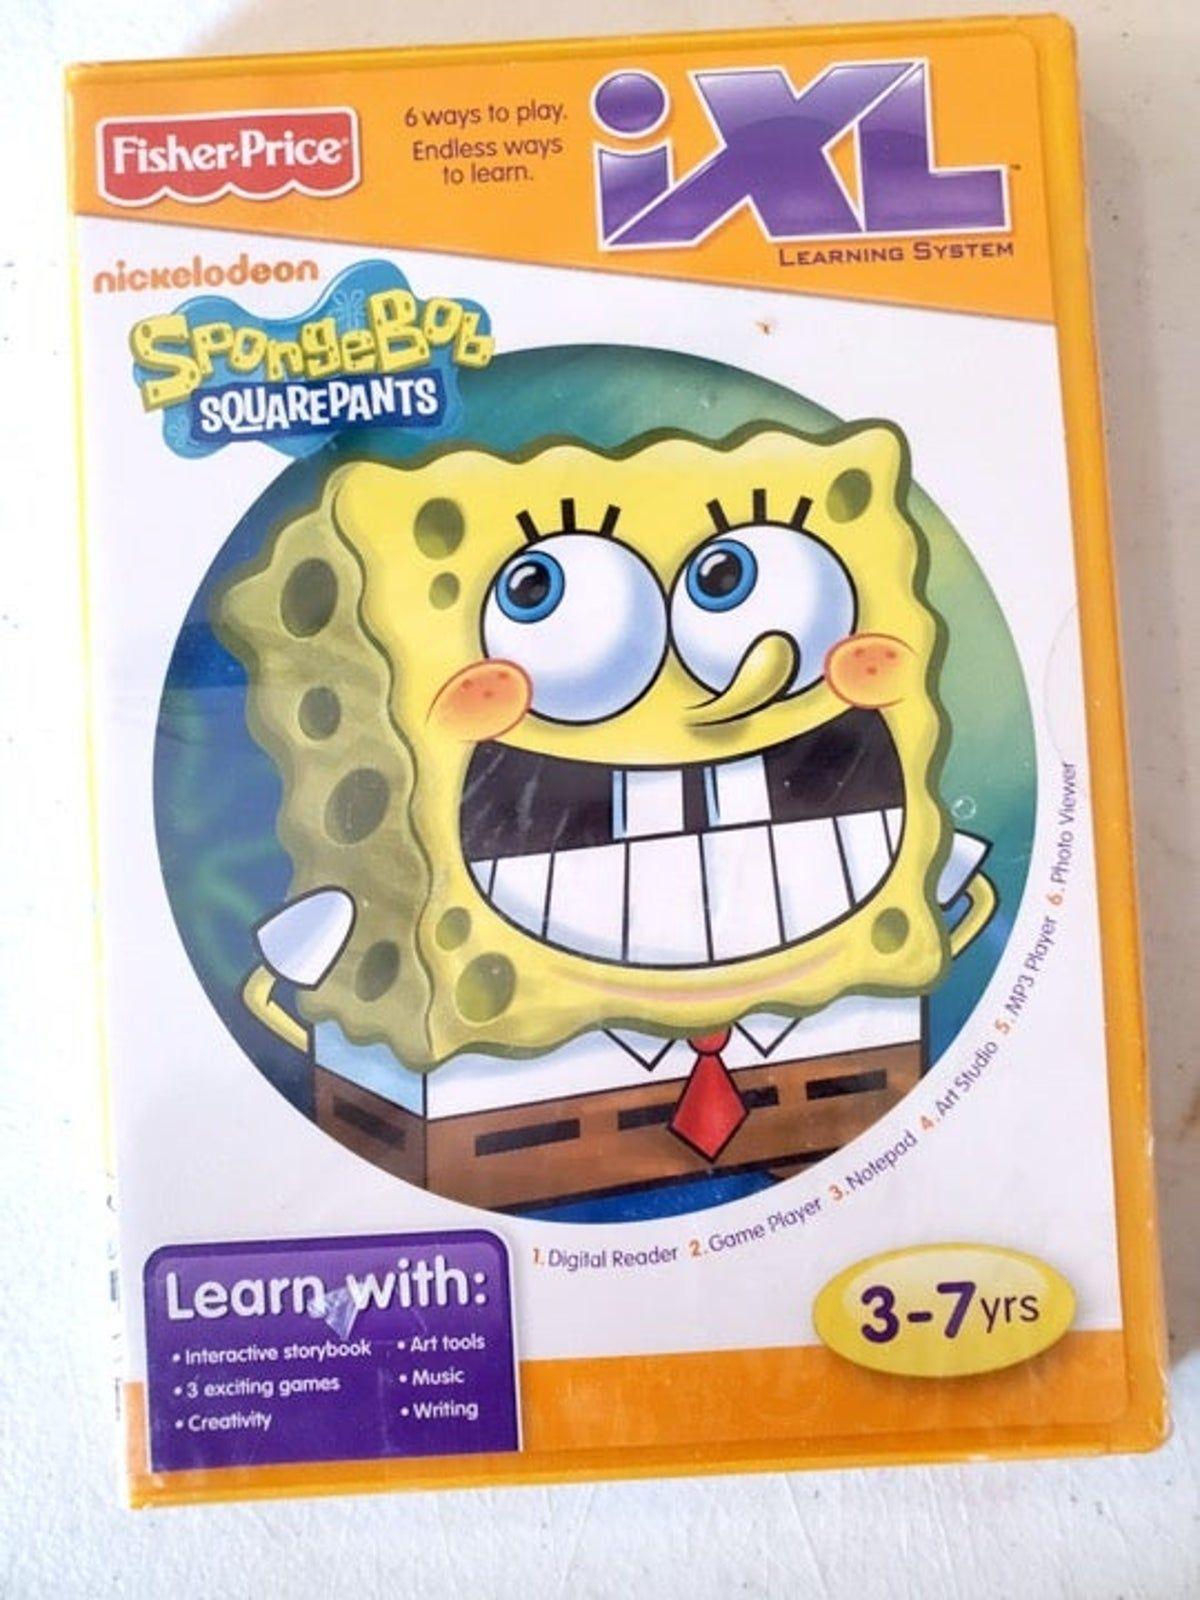 Spongebob Squarepants IXL Software Game in 2020 Ixl